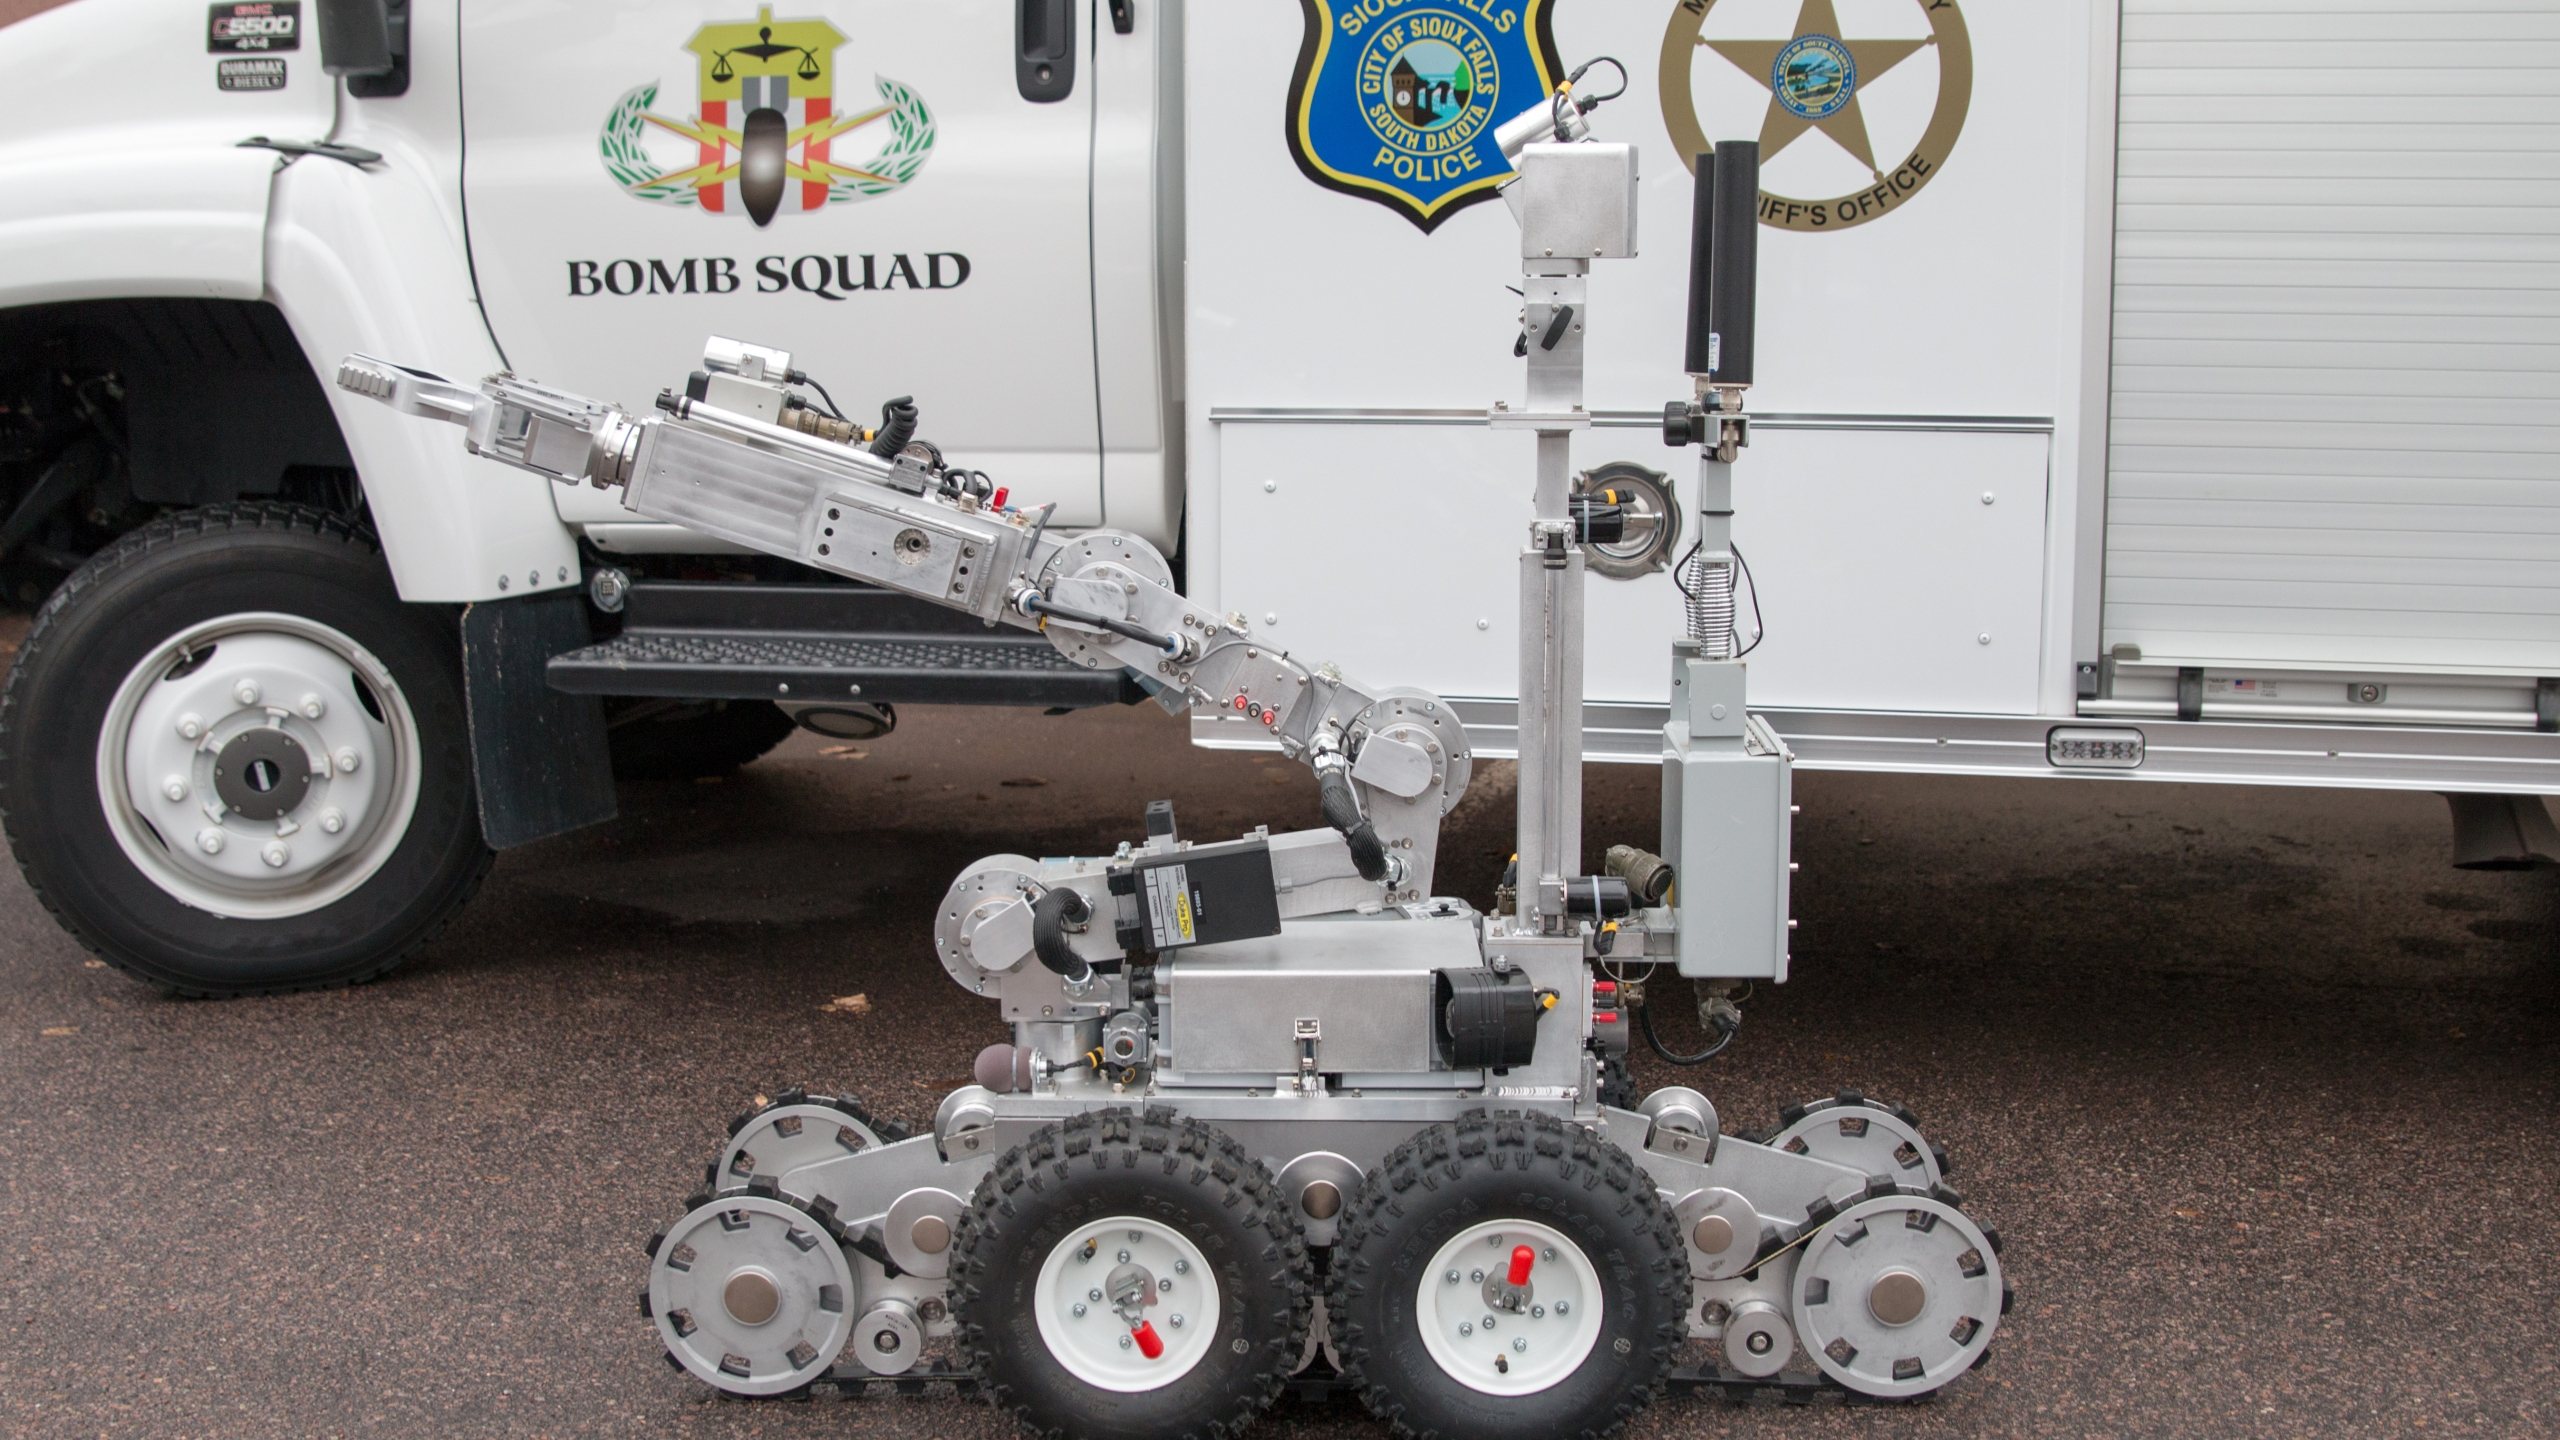 KELO Sioux Falls Police bomb robot closeup